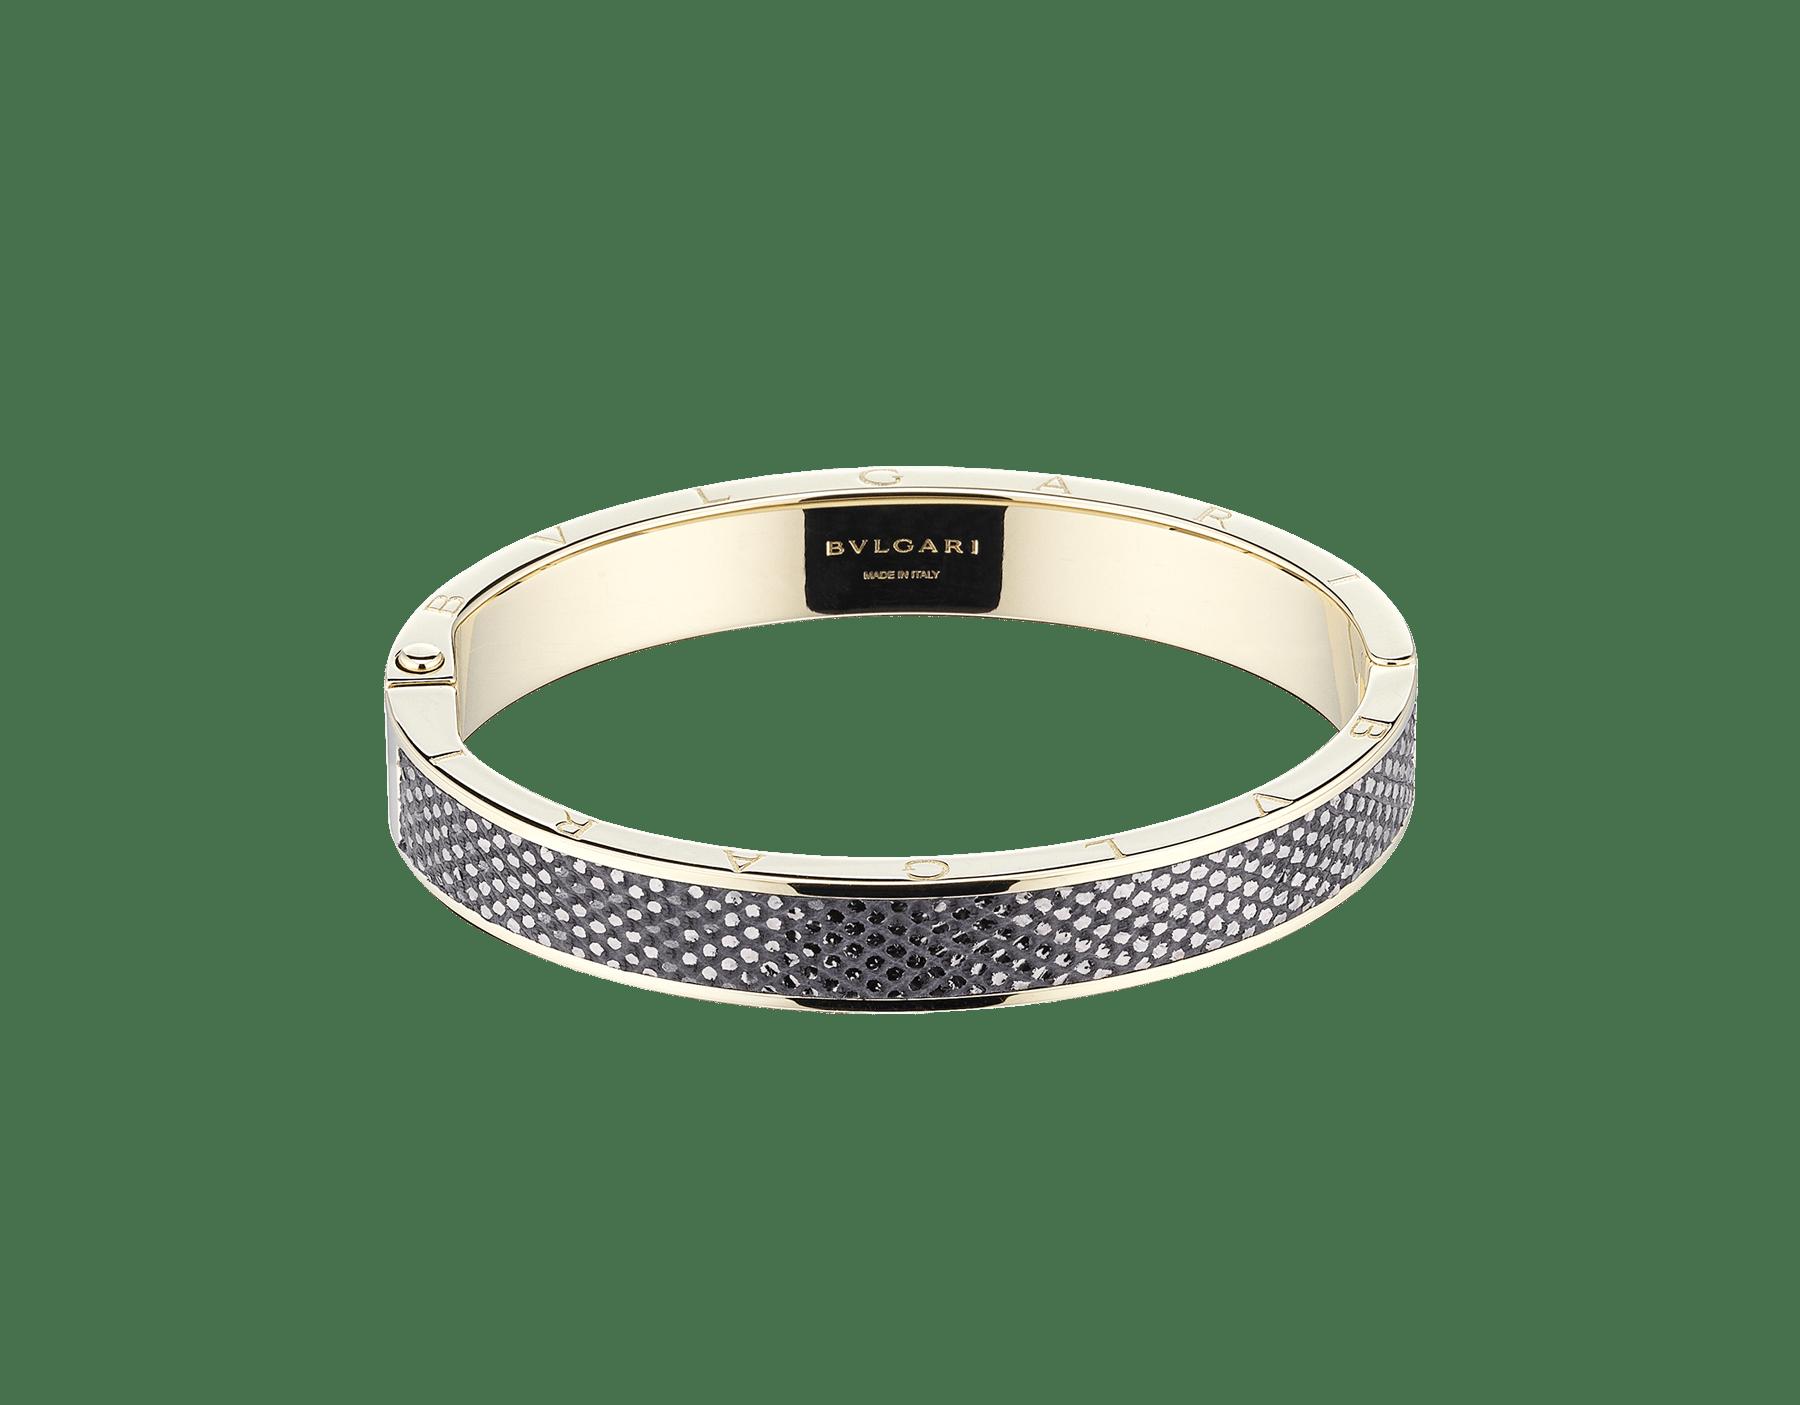 """BVLGARI BVLGARI"" bangle bracelet in light gold-plated brass with a Charcoal Diamond grey metallic karung skin insert and a BVLGARI logo hinge closure. Logo engraving along the edges of both sides of the bracelet and in the inner part. HINGELOGOBRACLT-MK-CD image 2"